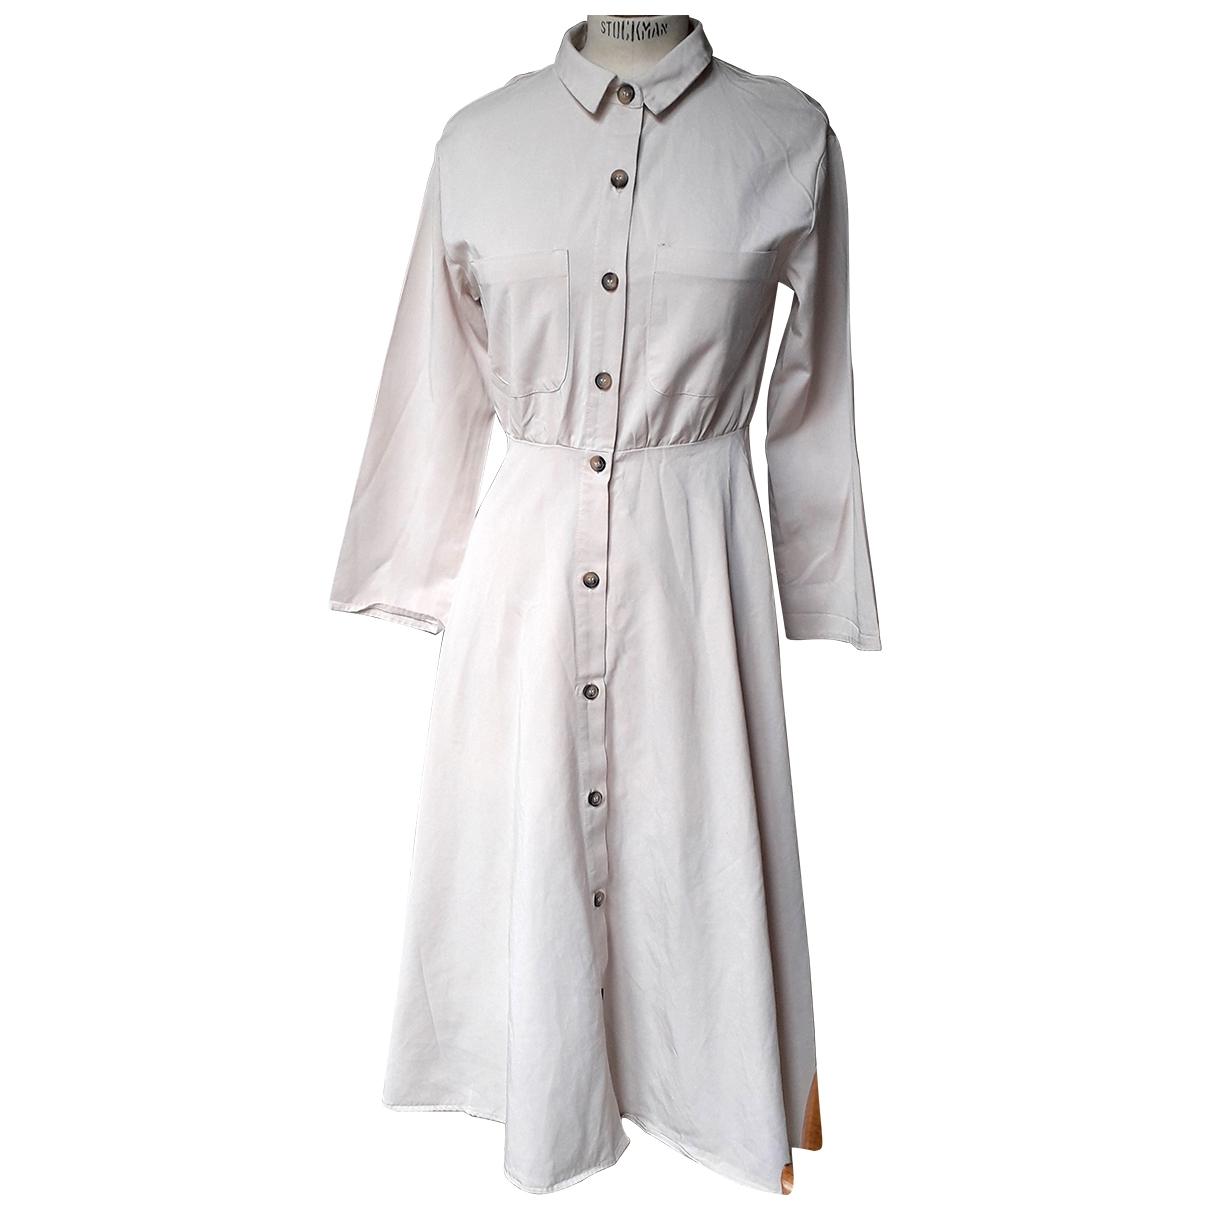 Zara - Robe   pour femme en coton - beige